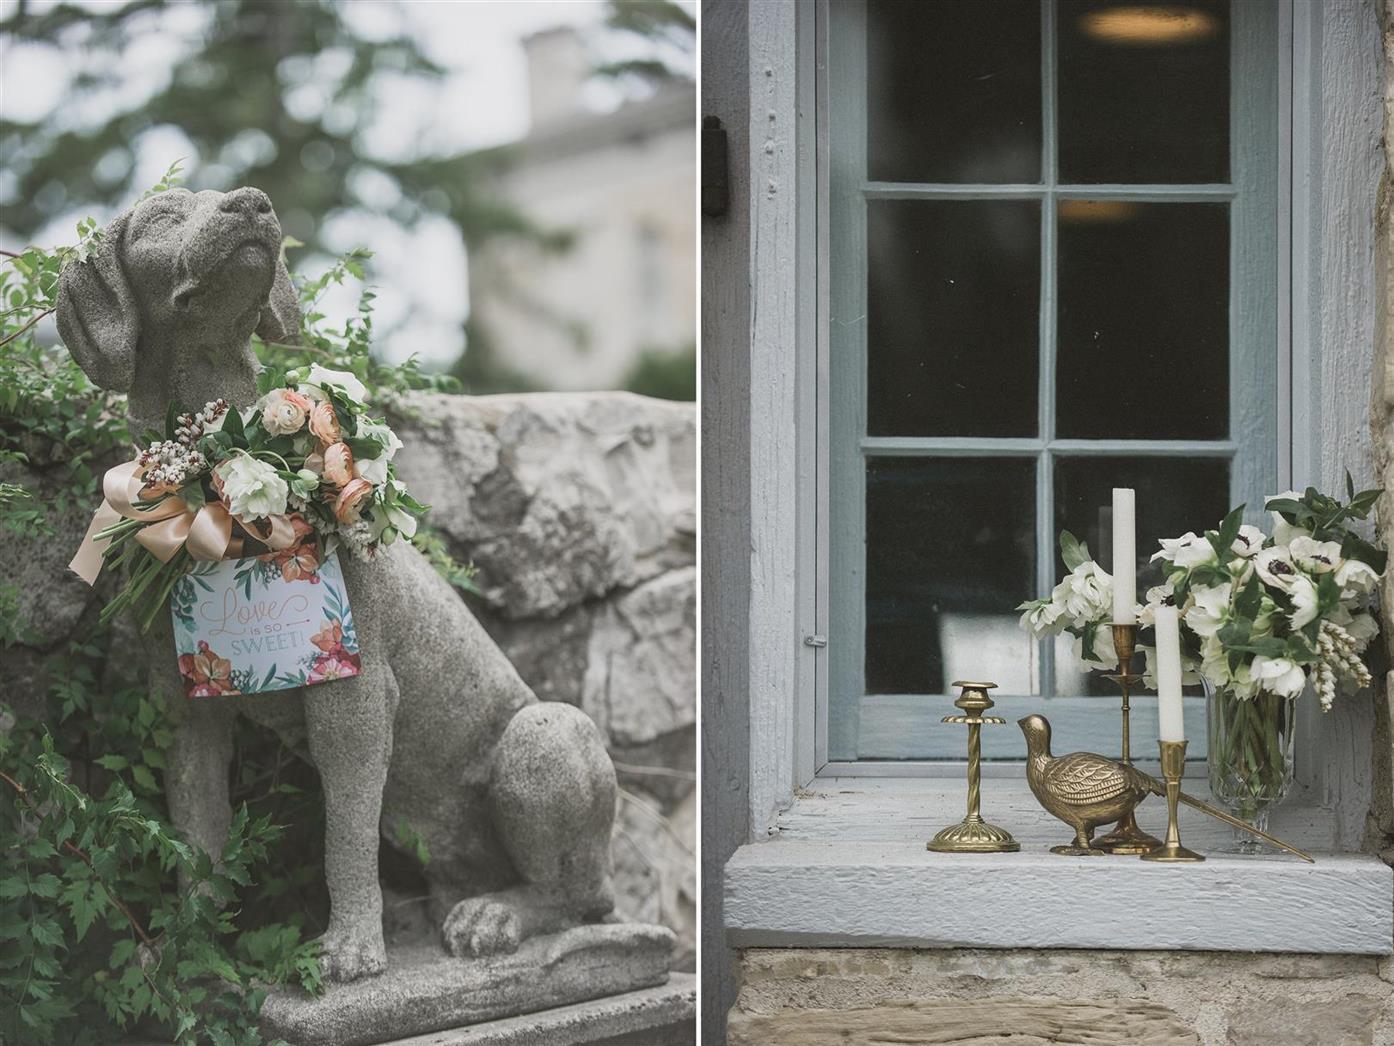 Vintage Wedding Decor - A Romantic Vintage Wedding Inspiration Shoot from Sue Gallo Designs